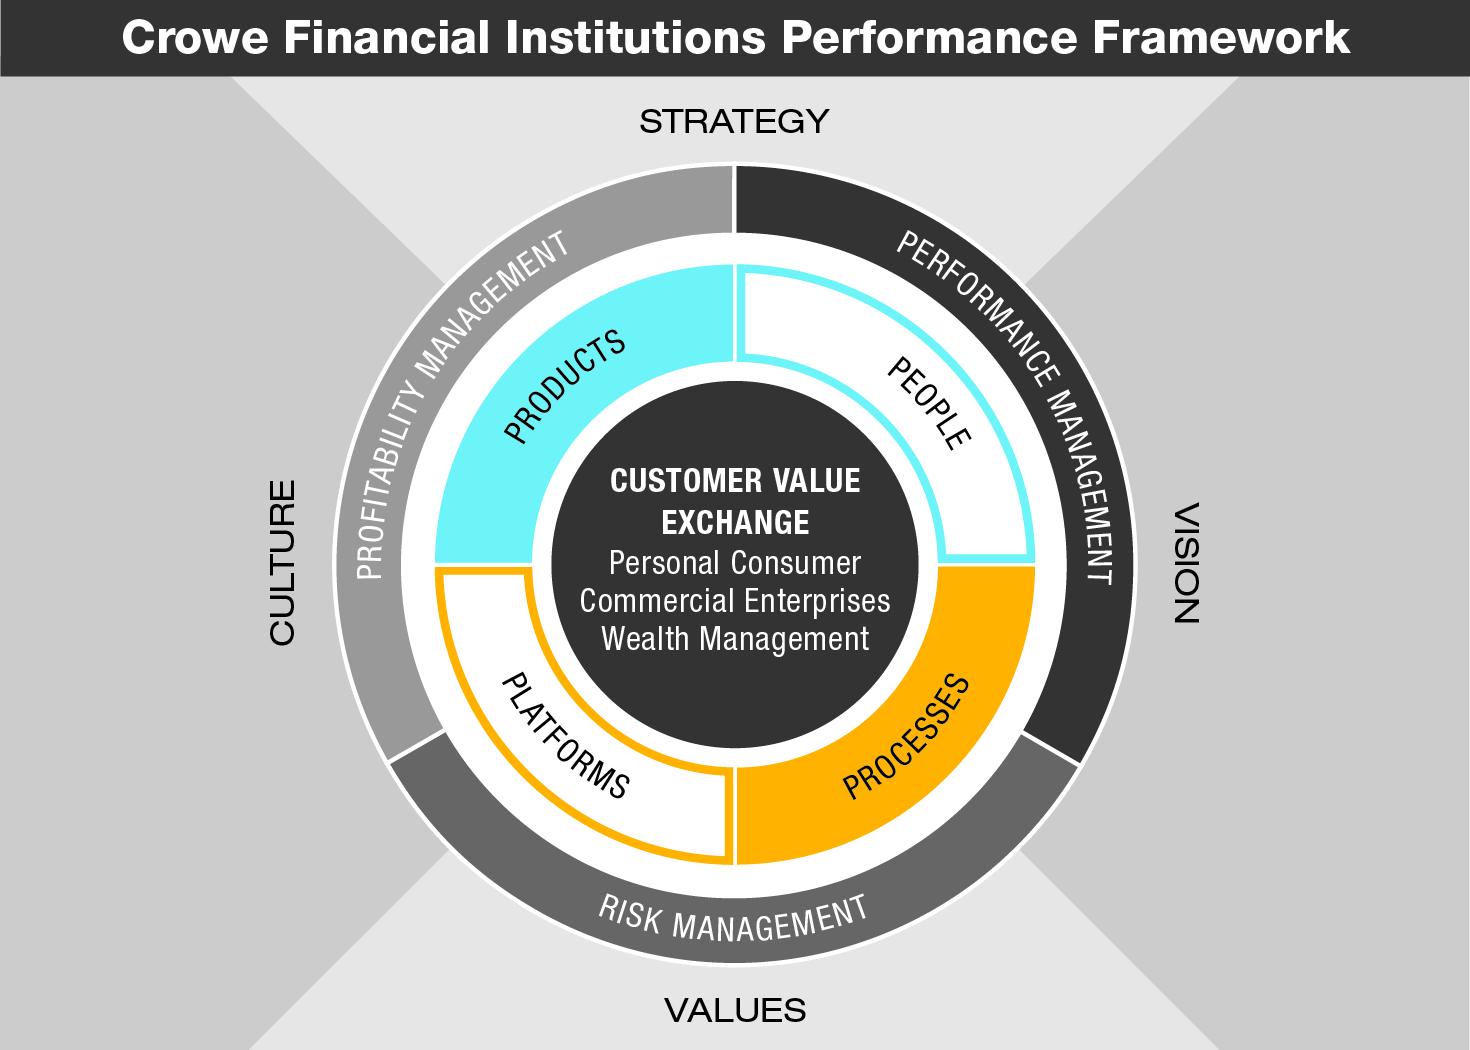 FS-17012-047 Performance Framework Diagram-01